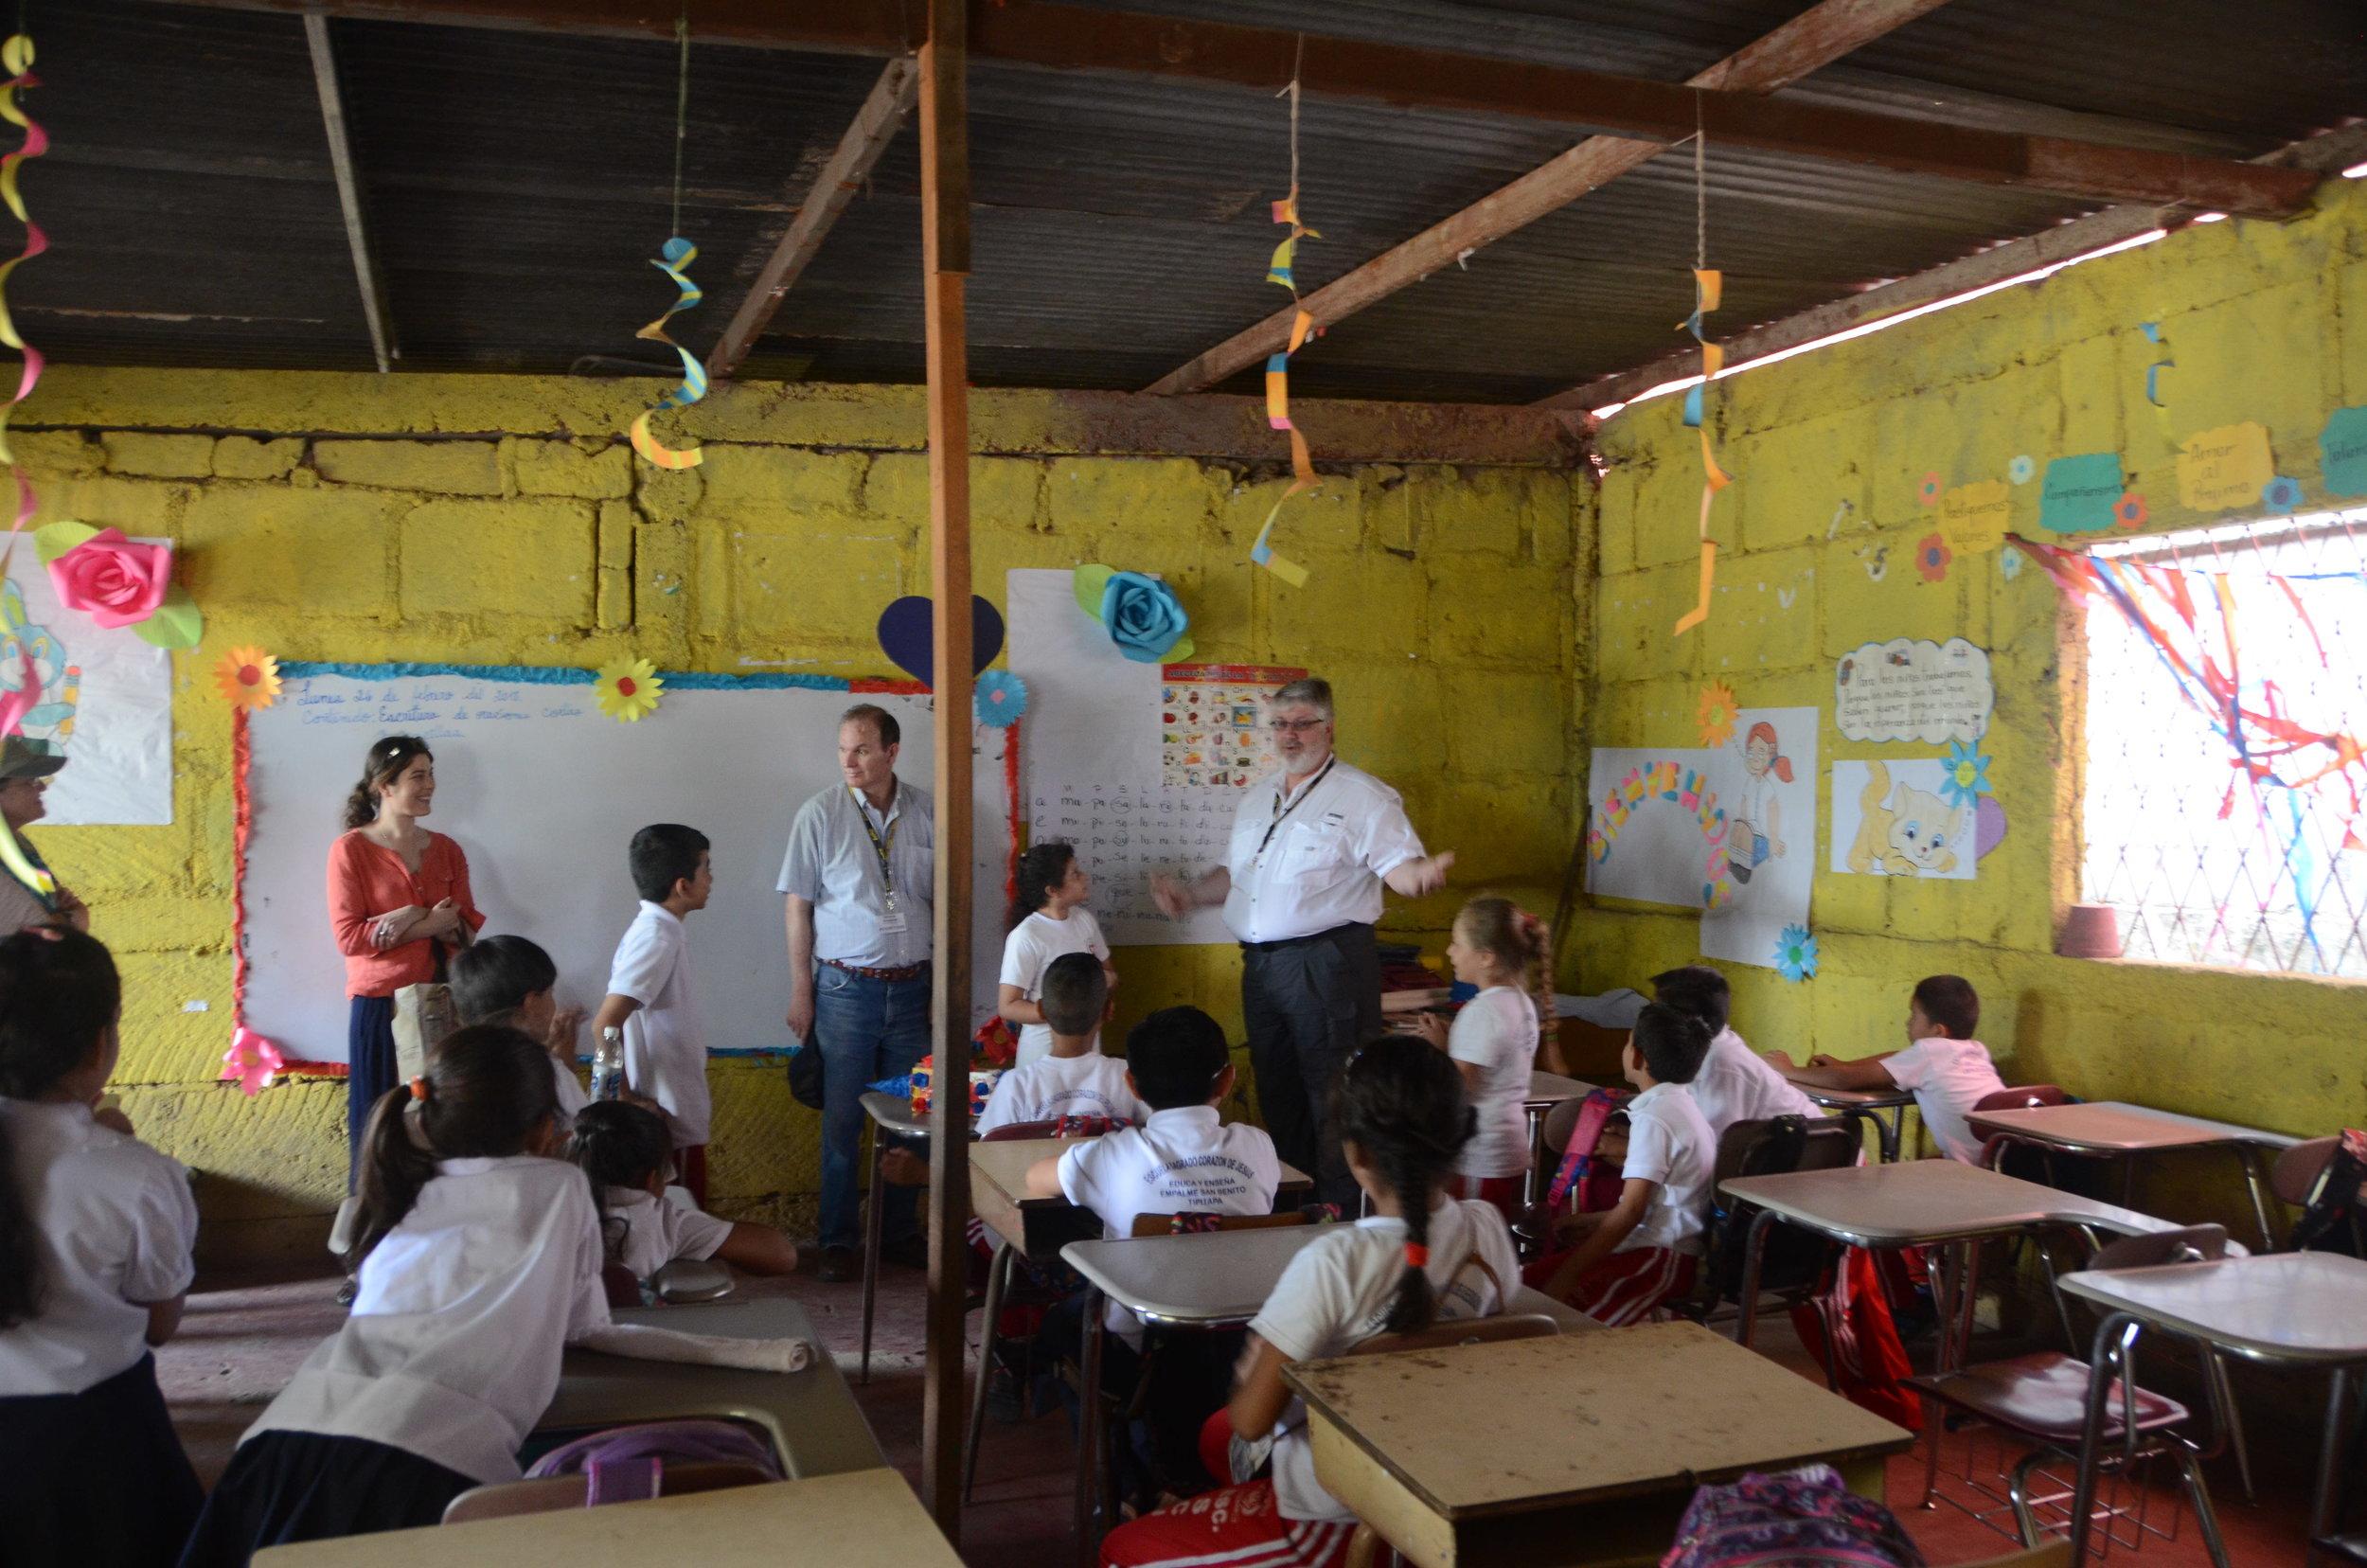 Mayor Mike teaching the kids the English Alphabet.